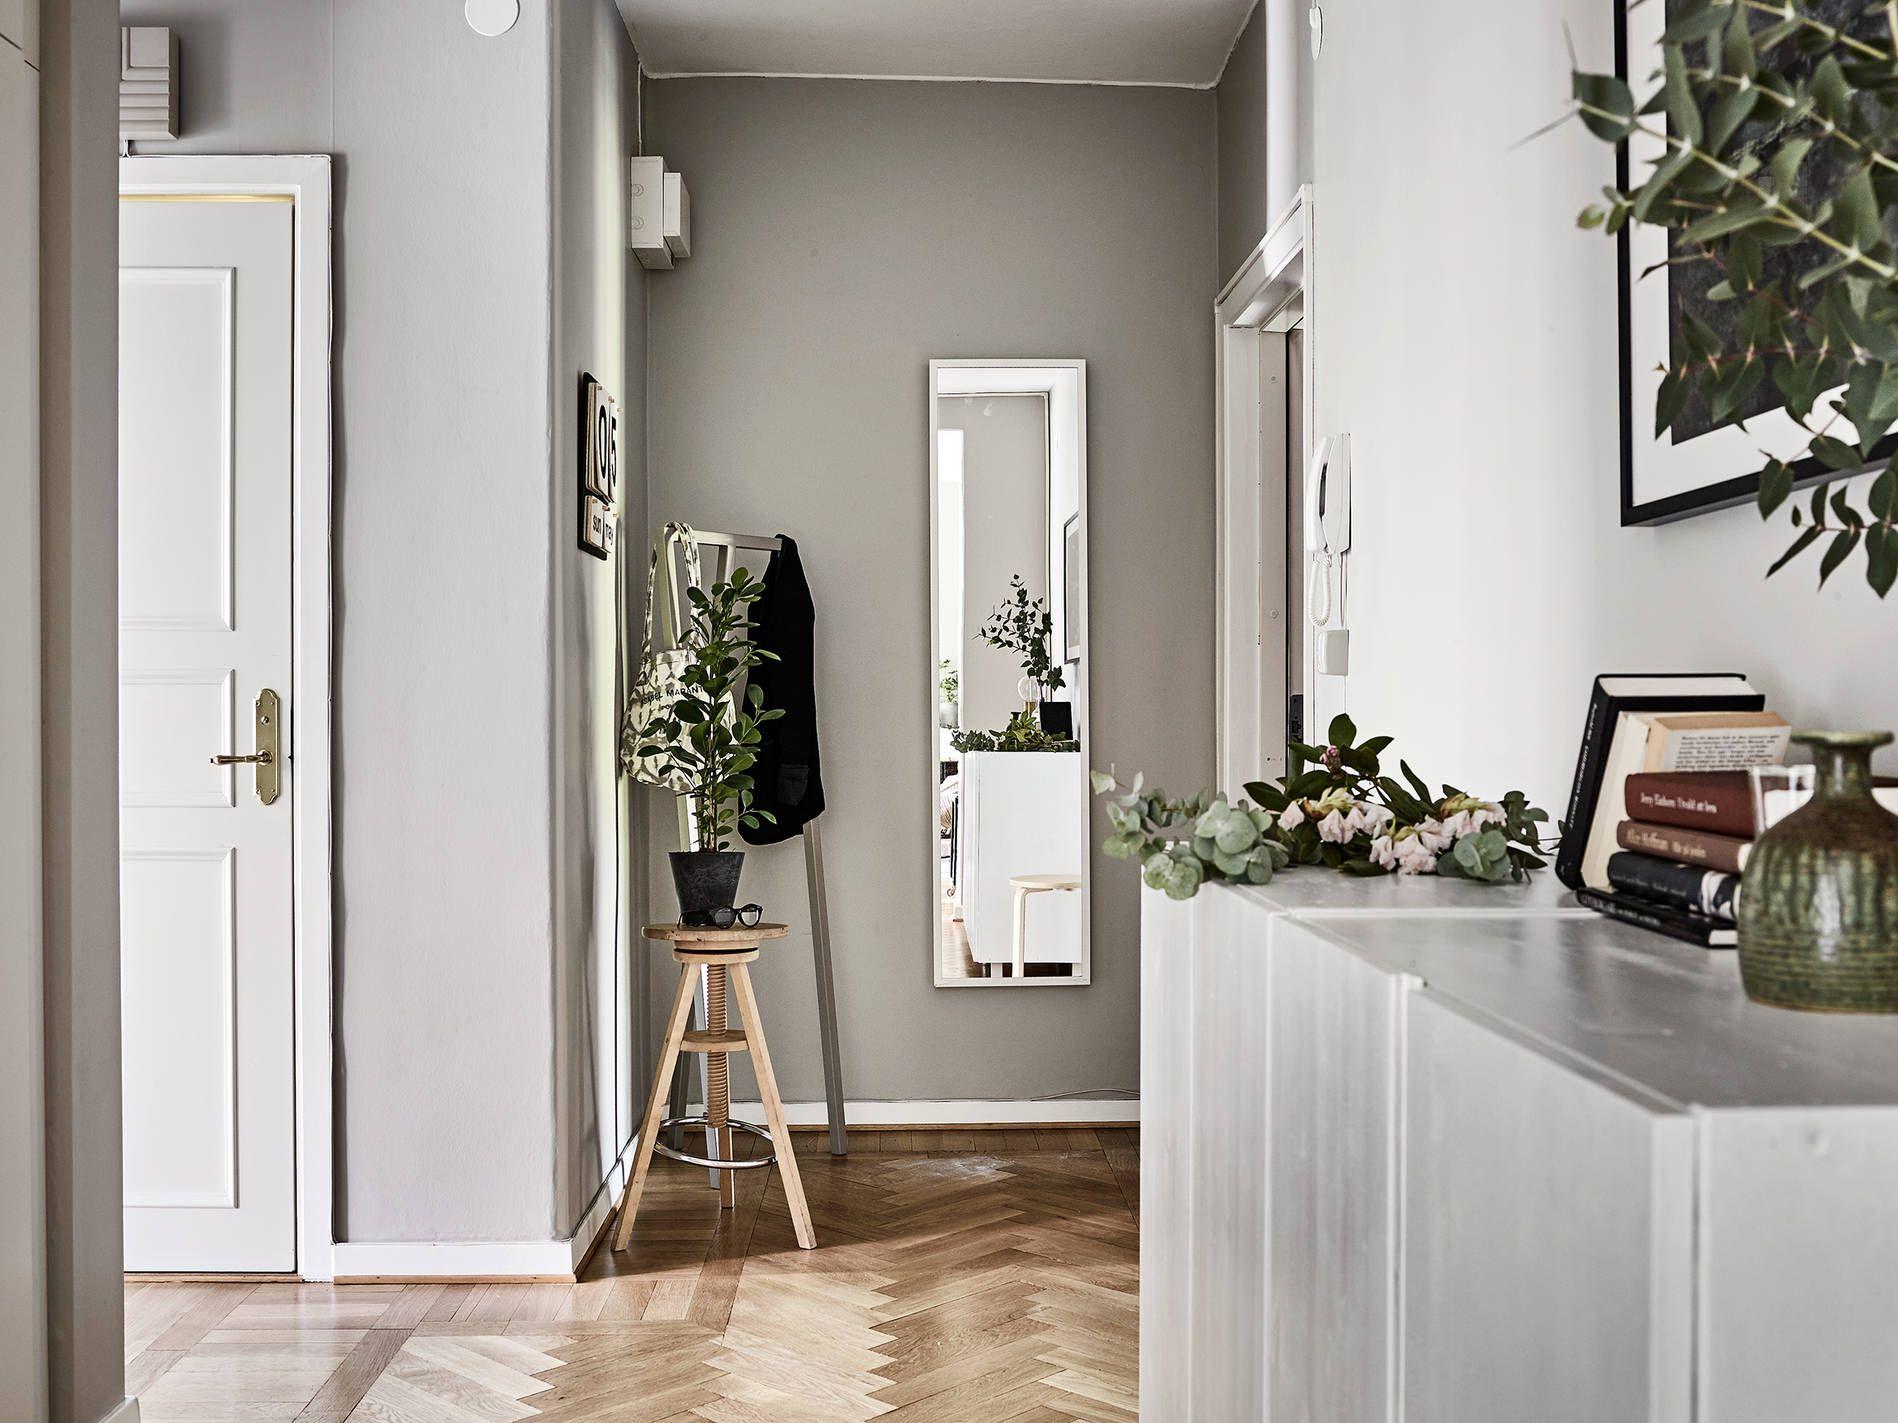 Hallway wall storage  Scandinavian interior design  interiors  Pinterest  Scandinavian